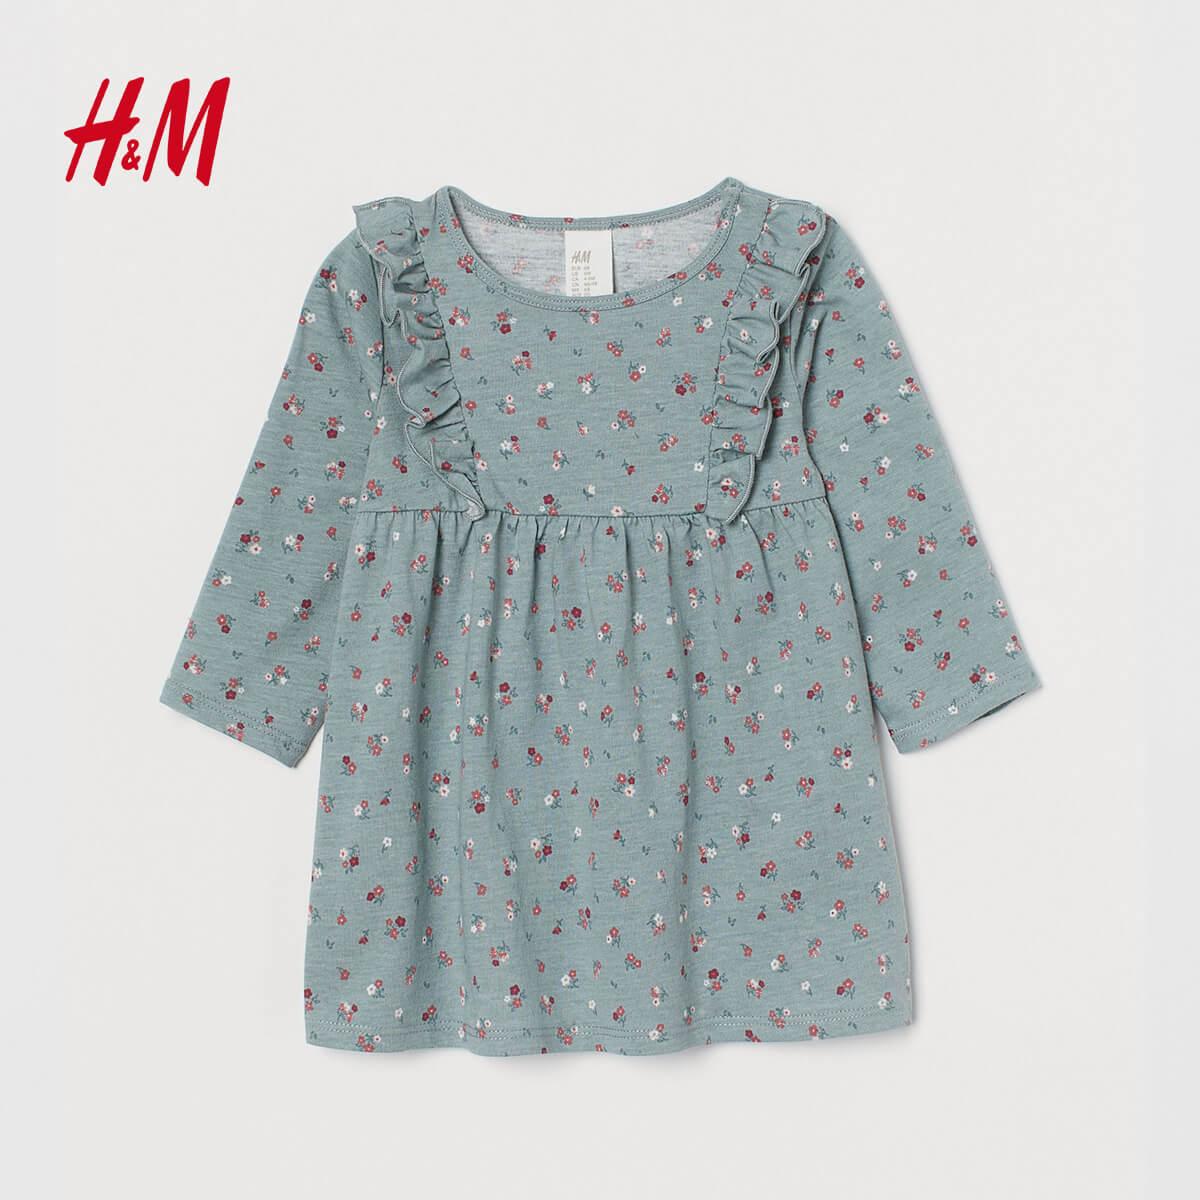 H&M Mint Green Floral Frill Trimmed Jersey Dress